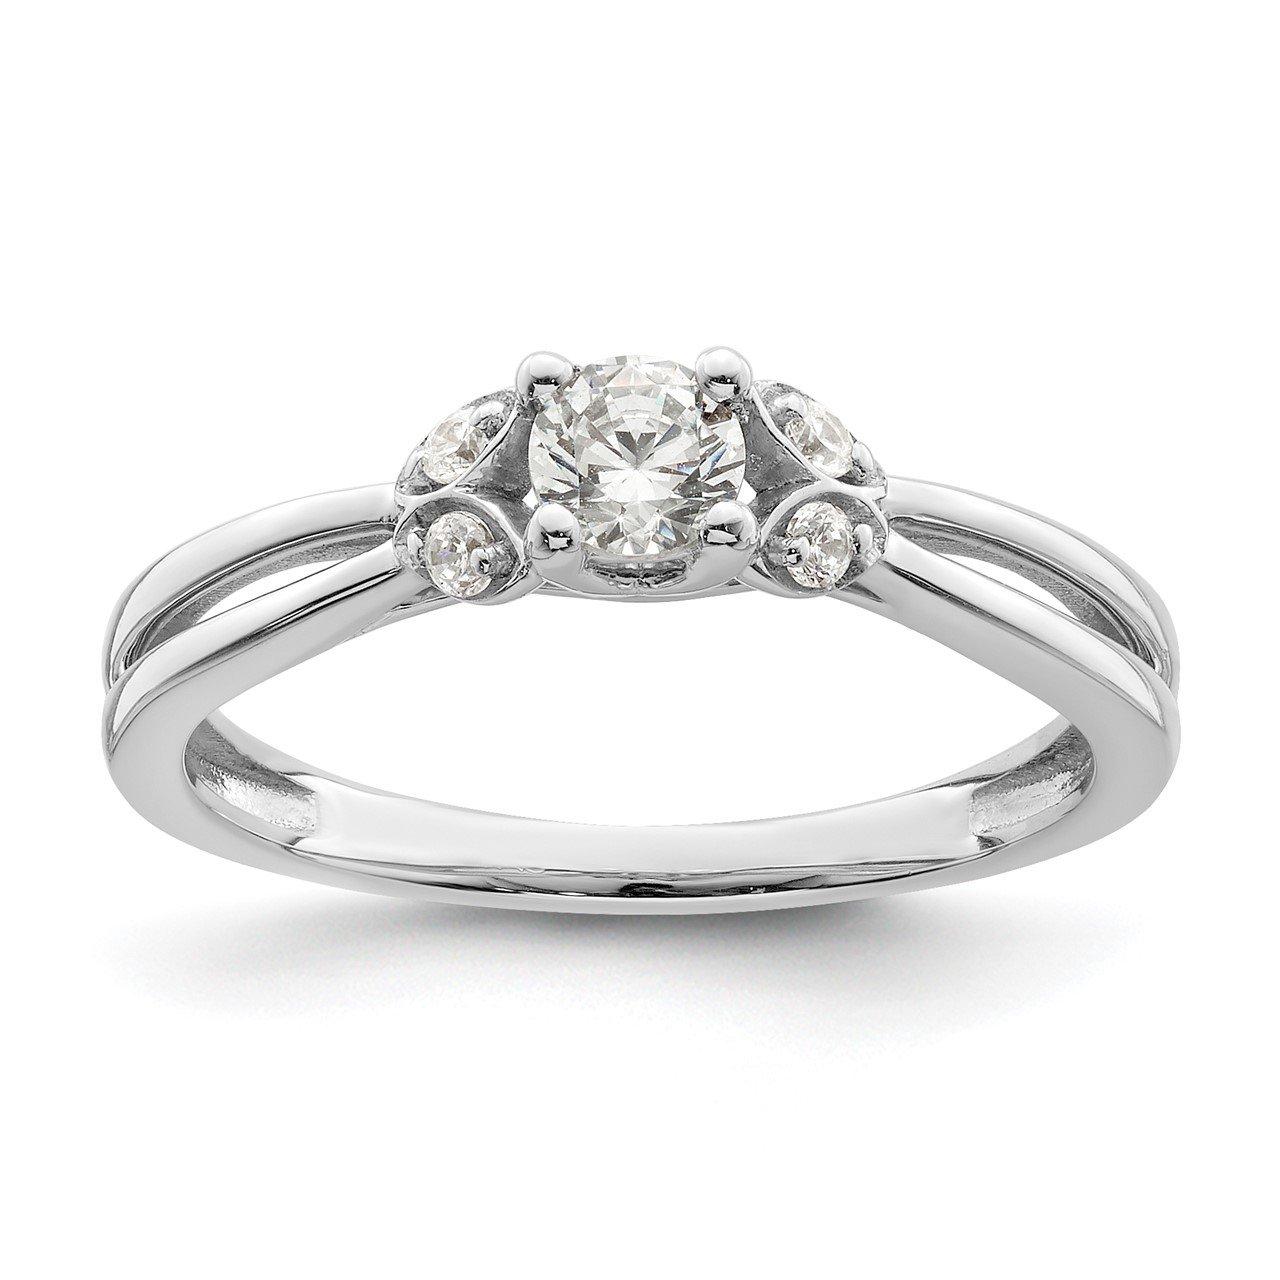 14K White Gold Polish Complete Round Dia. Engagement Ring